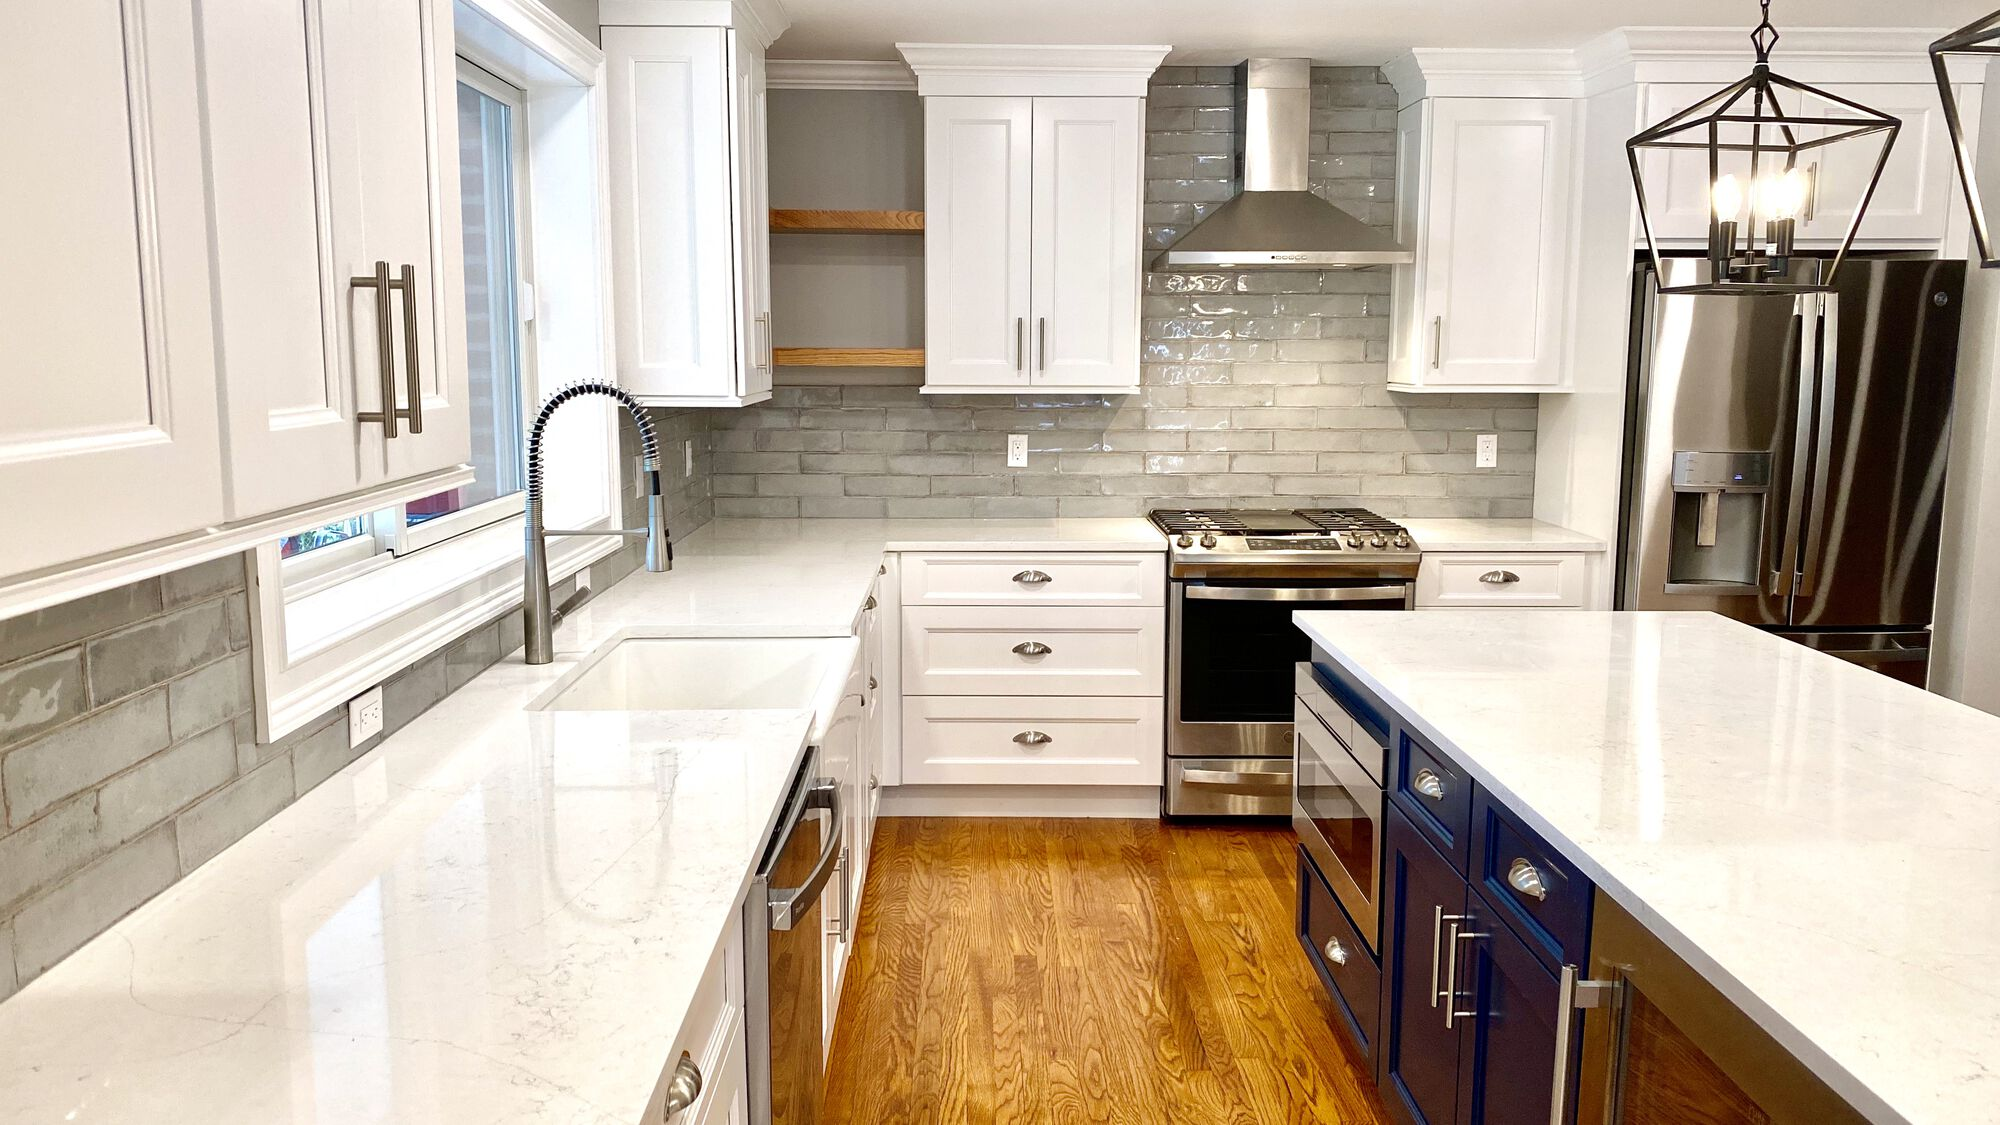 Kitchen Renovation with Open Shelving, Glazed Porcelain Backsplash, Custom Blue Island in Bloomfield, Essex County NJ